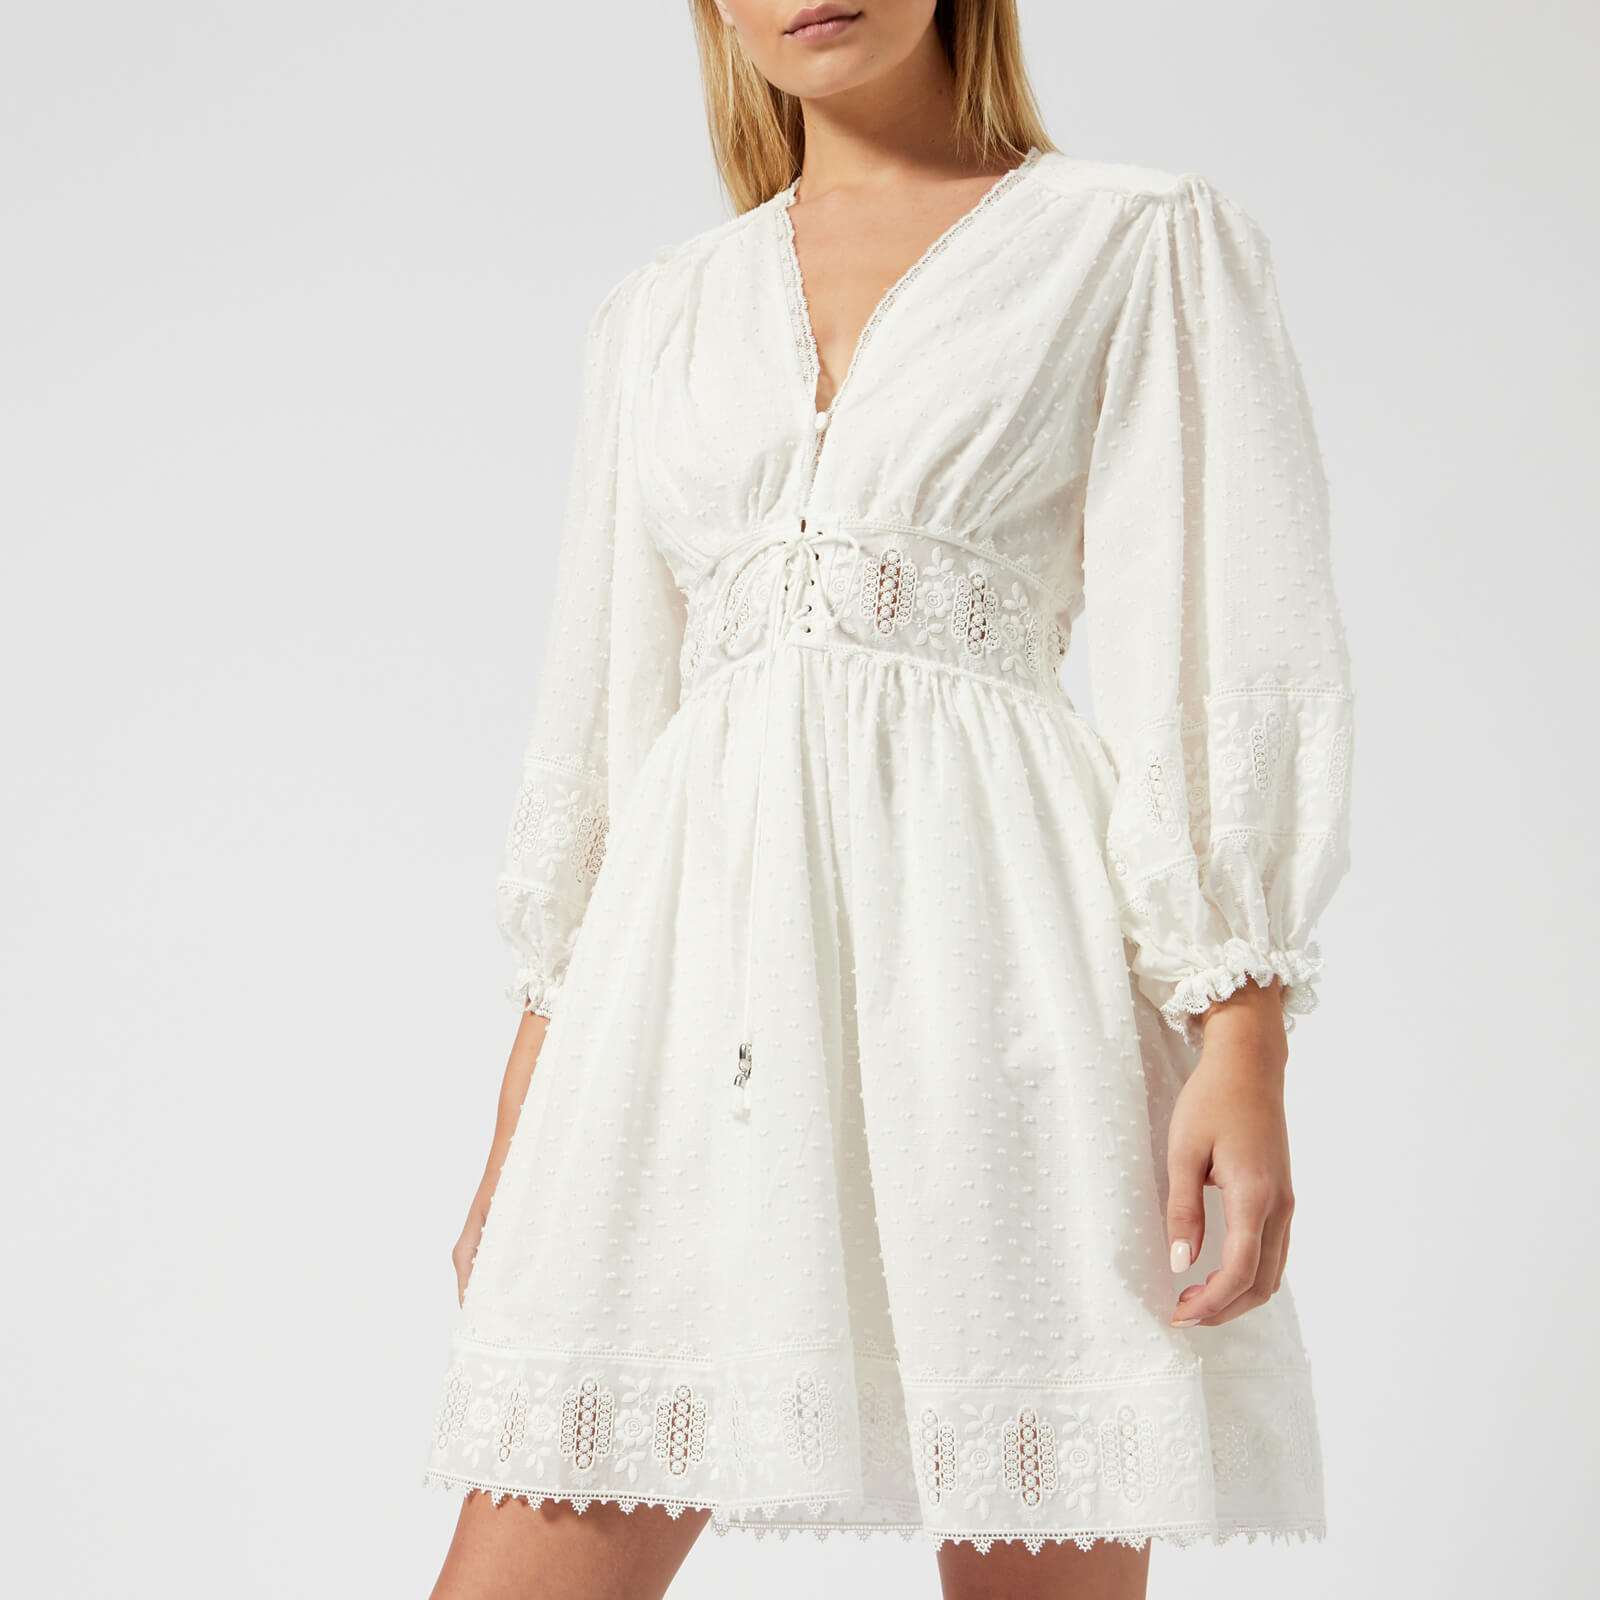 db69e2357ca Zimmermann Women s Iris Corset Waist Dress - Ivory - Free UK Delivery over £ 50